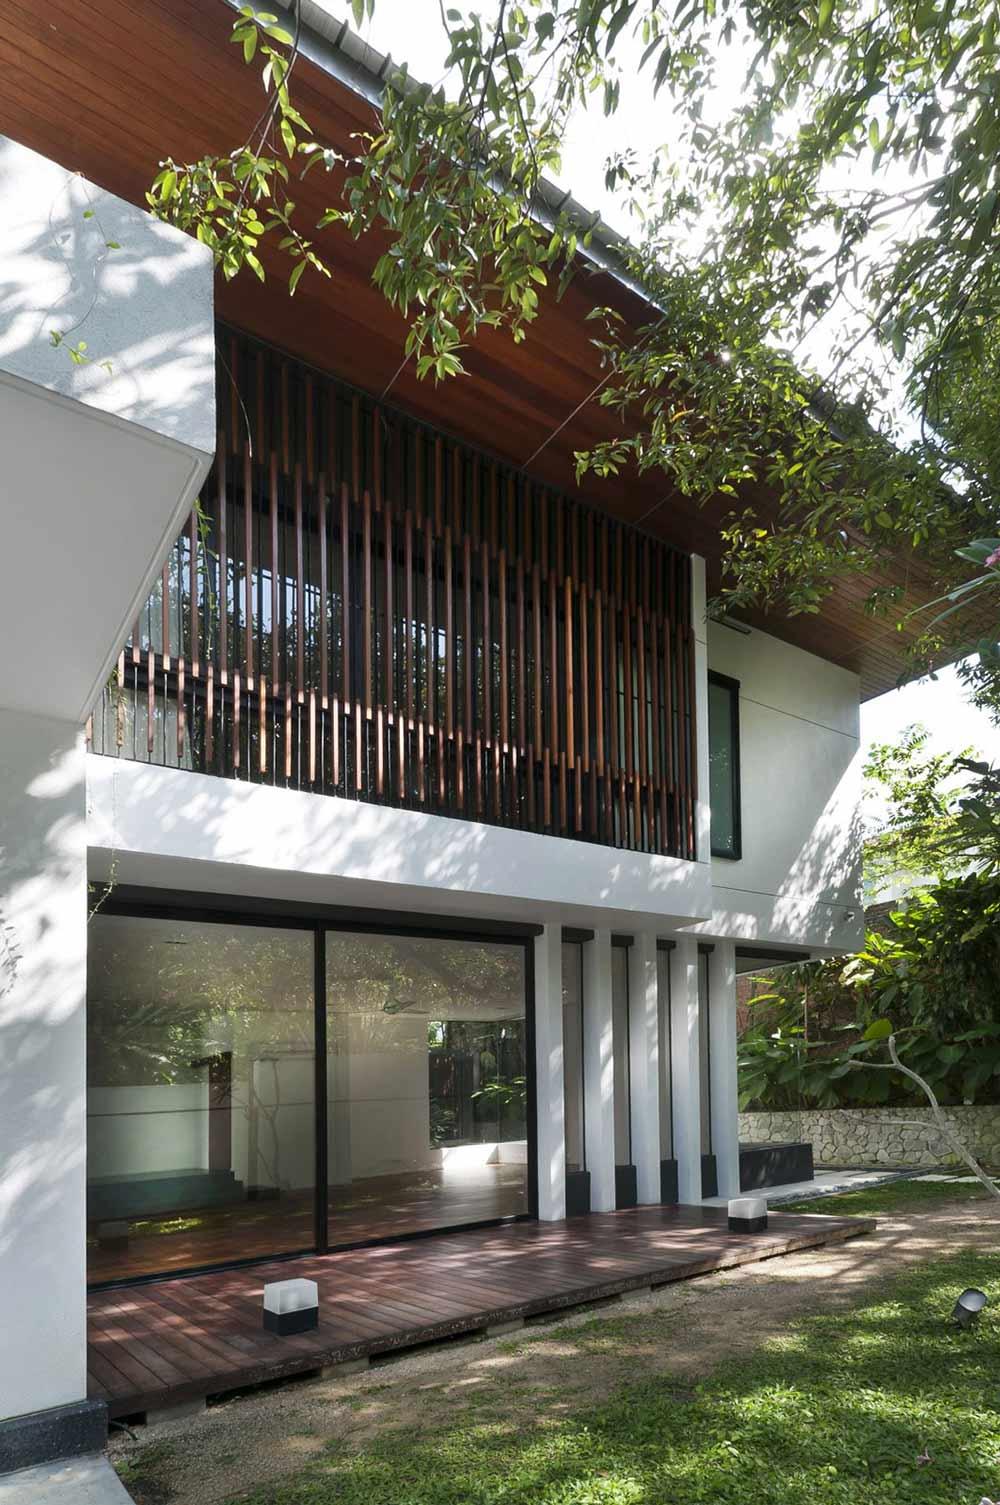 Wooden Deck, Patio Doors, Modern Home in Kuala Lumpur